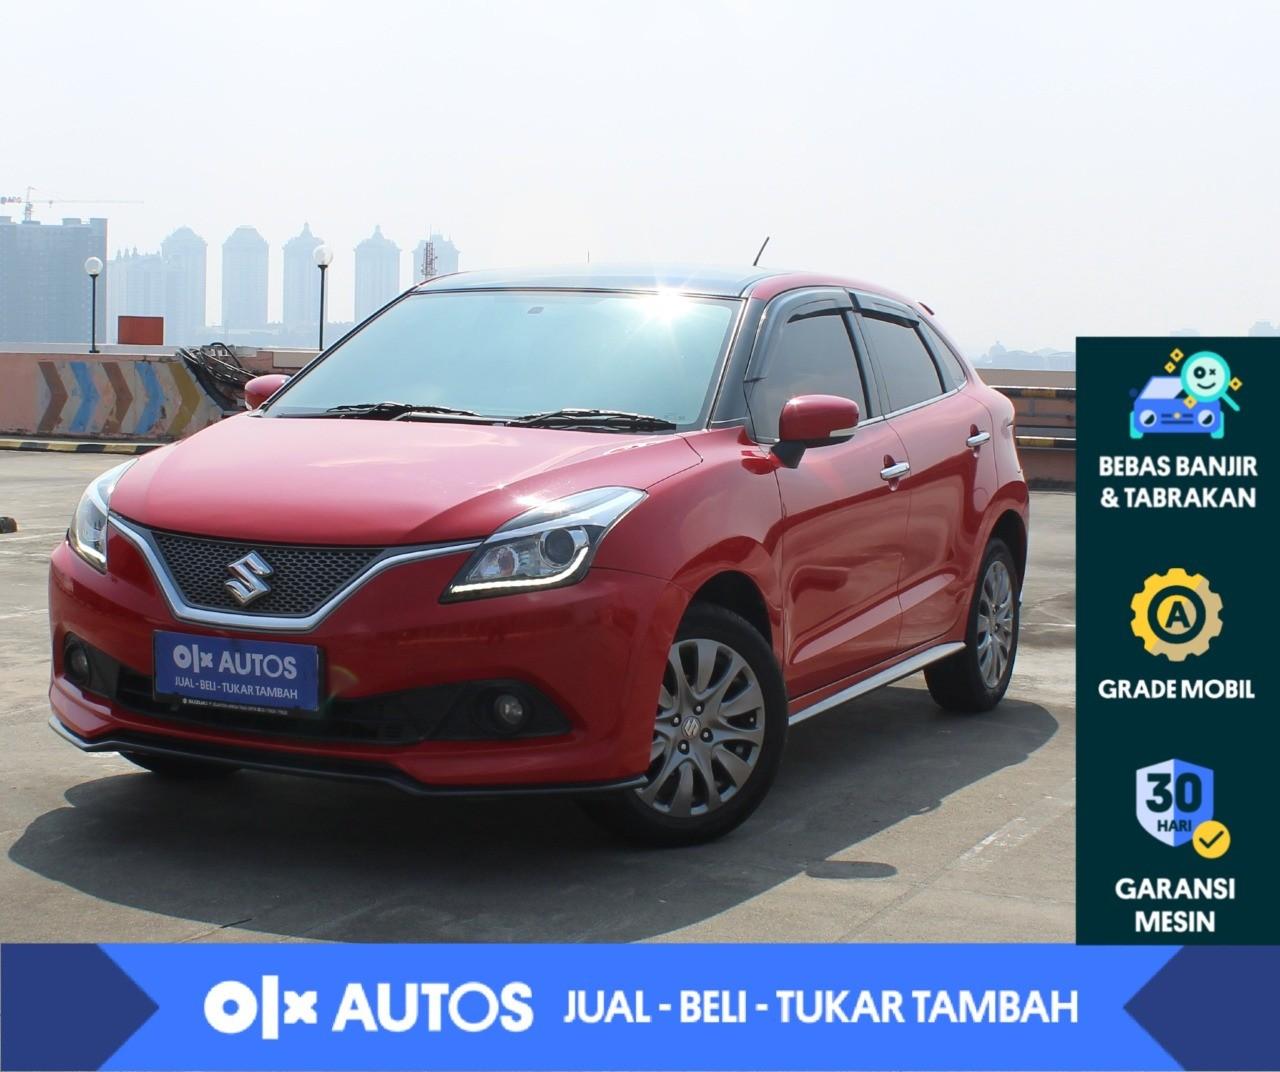 [ OLXAutos]  Suzuki Baleno 1.4 GL Bensin A/T  2018 Merah